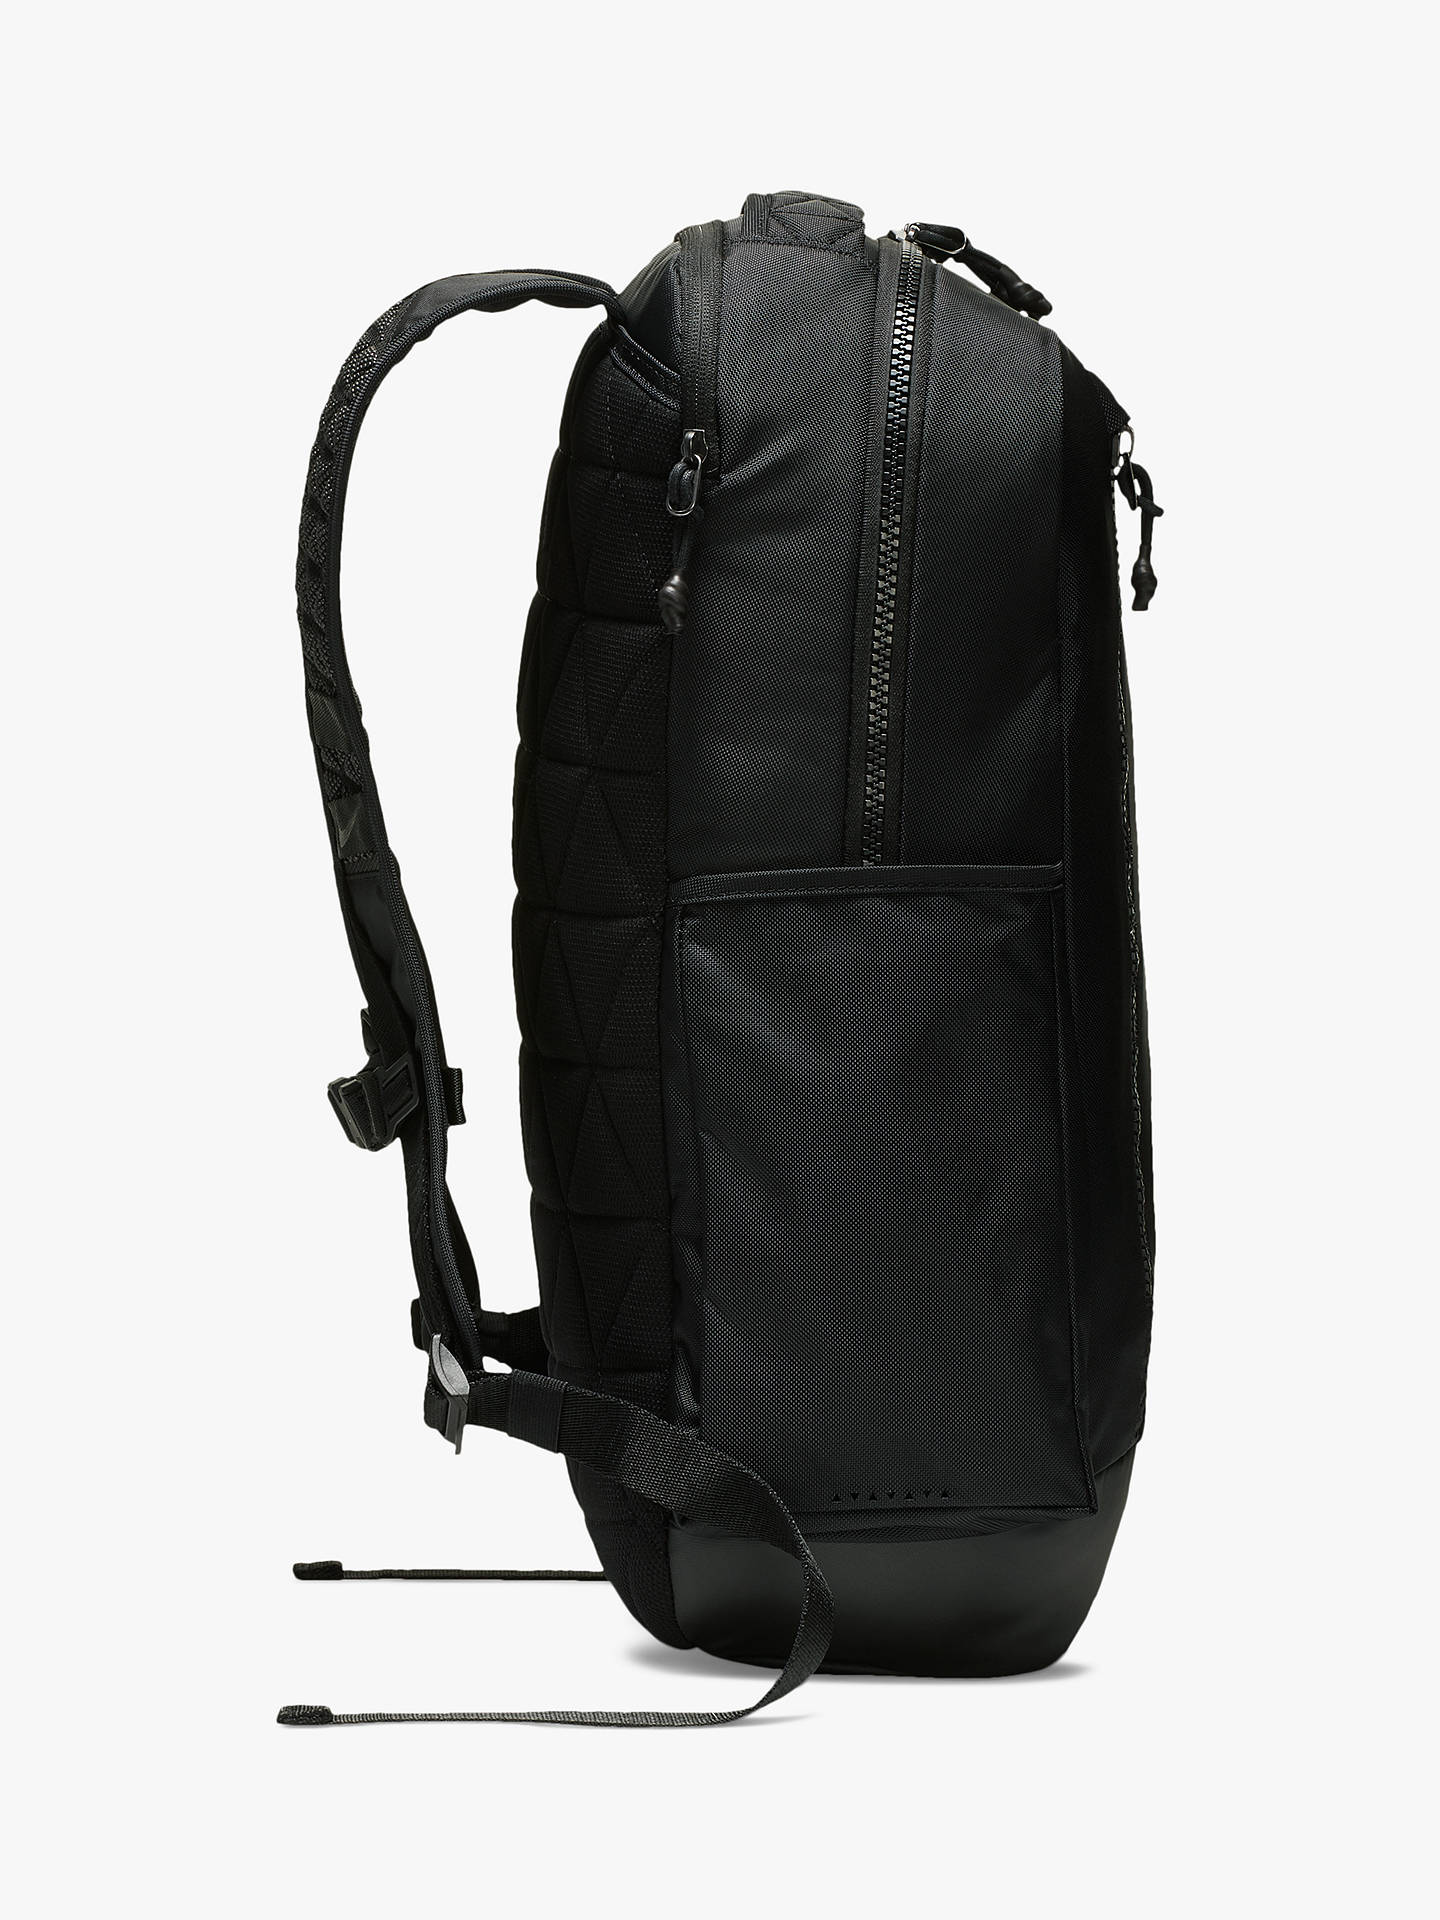 4e8aa8f05b2a ... BuyNike Vapor Power 2.0 Training Backpack